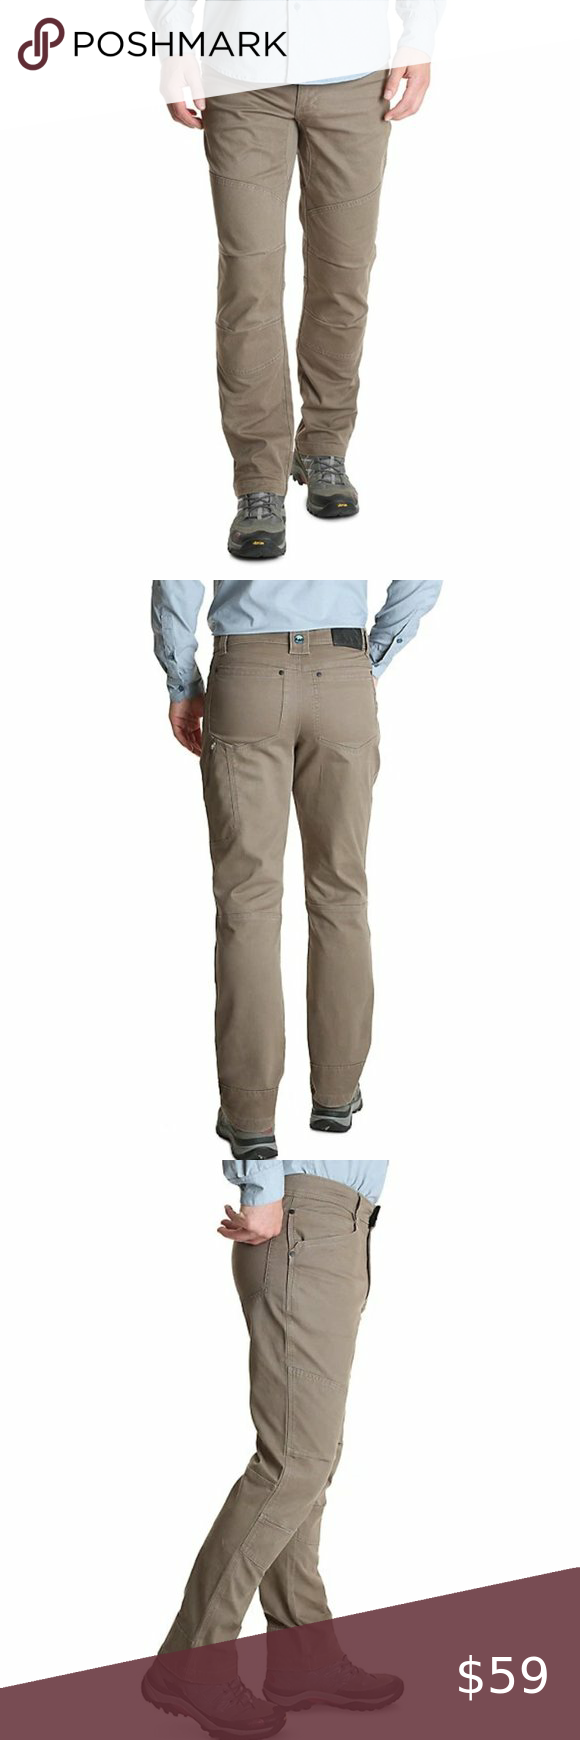 Wrangler Reinforced Utility Outdoor Pants Men S Outdoor Pants Mens Pants Cargo Work Pants